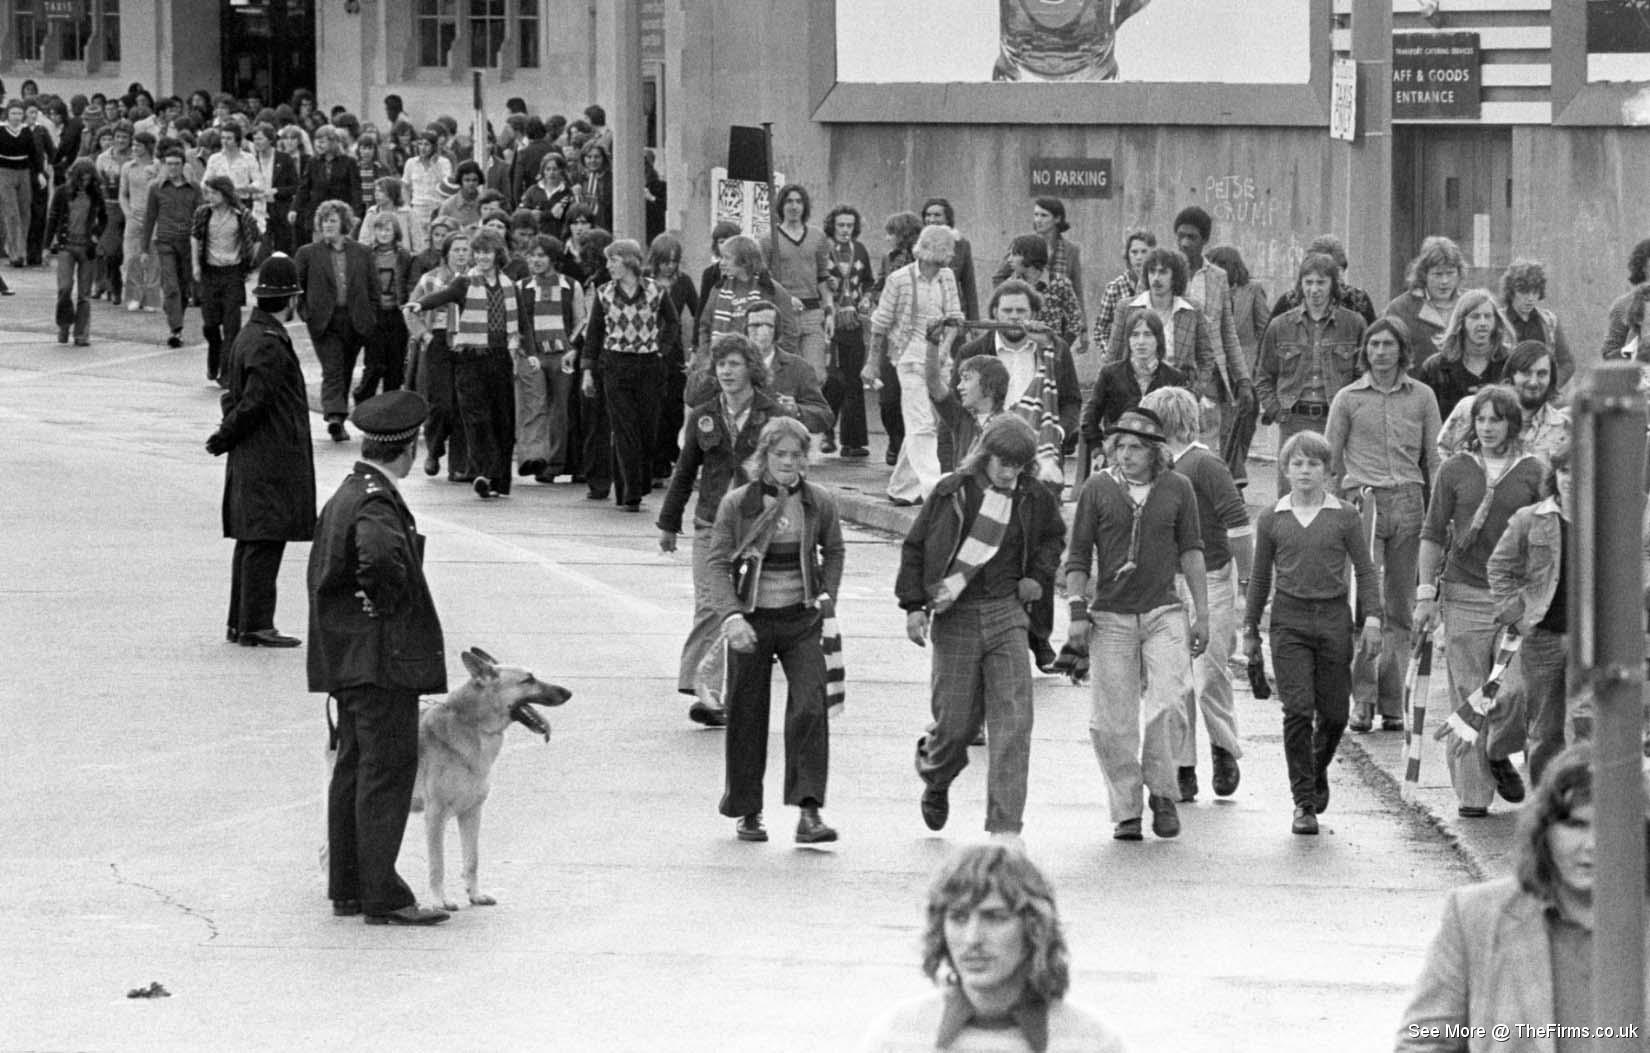 cardiff v man united 1974